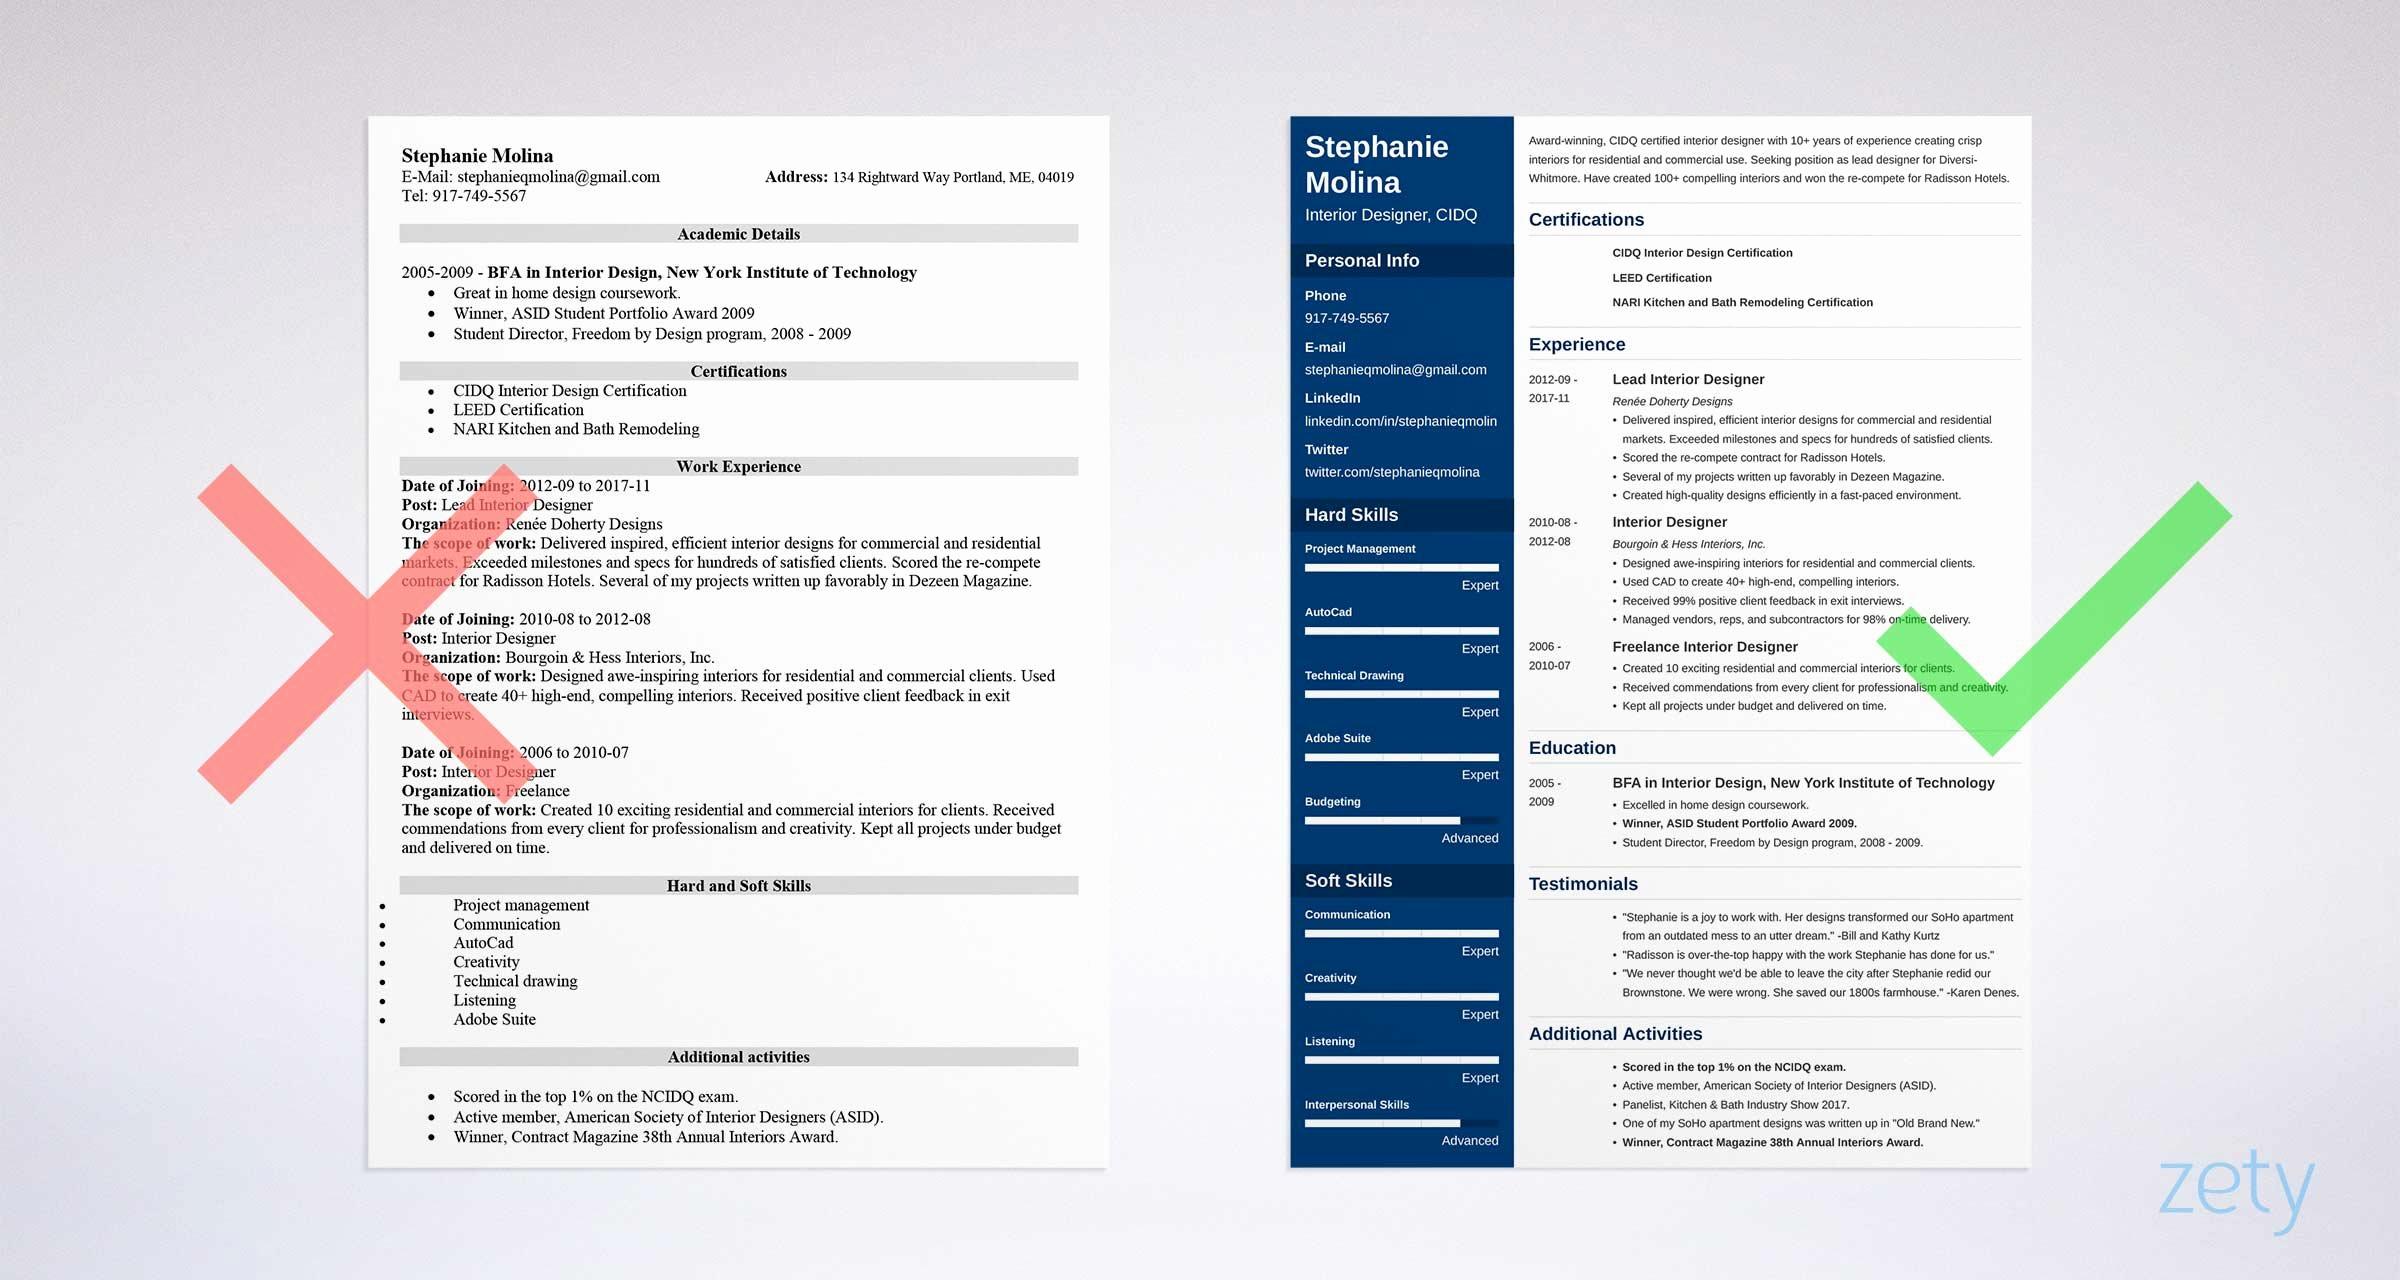 Free Printable Resume Templates Luxury Free Resume Templates 17 Free Cv Templates to Download & Use